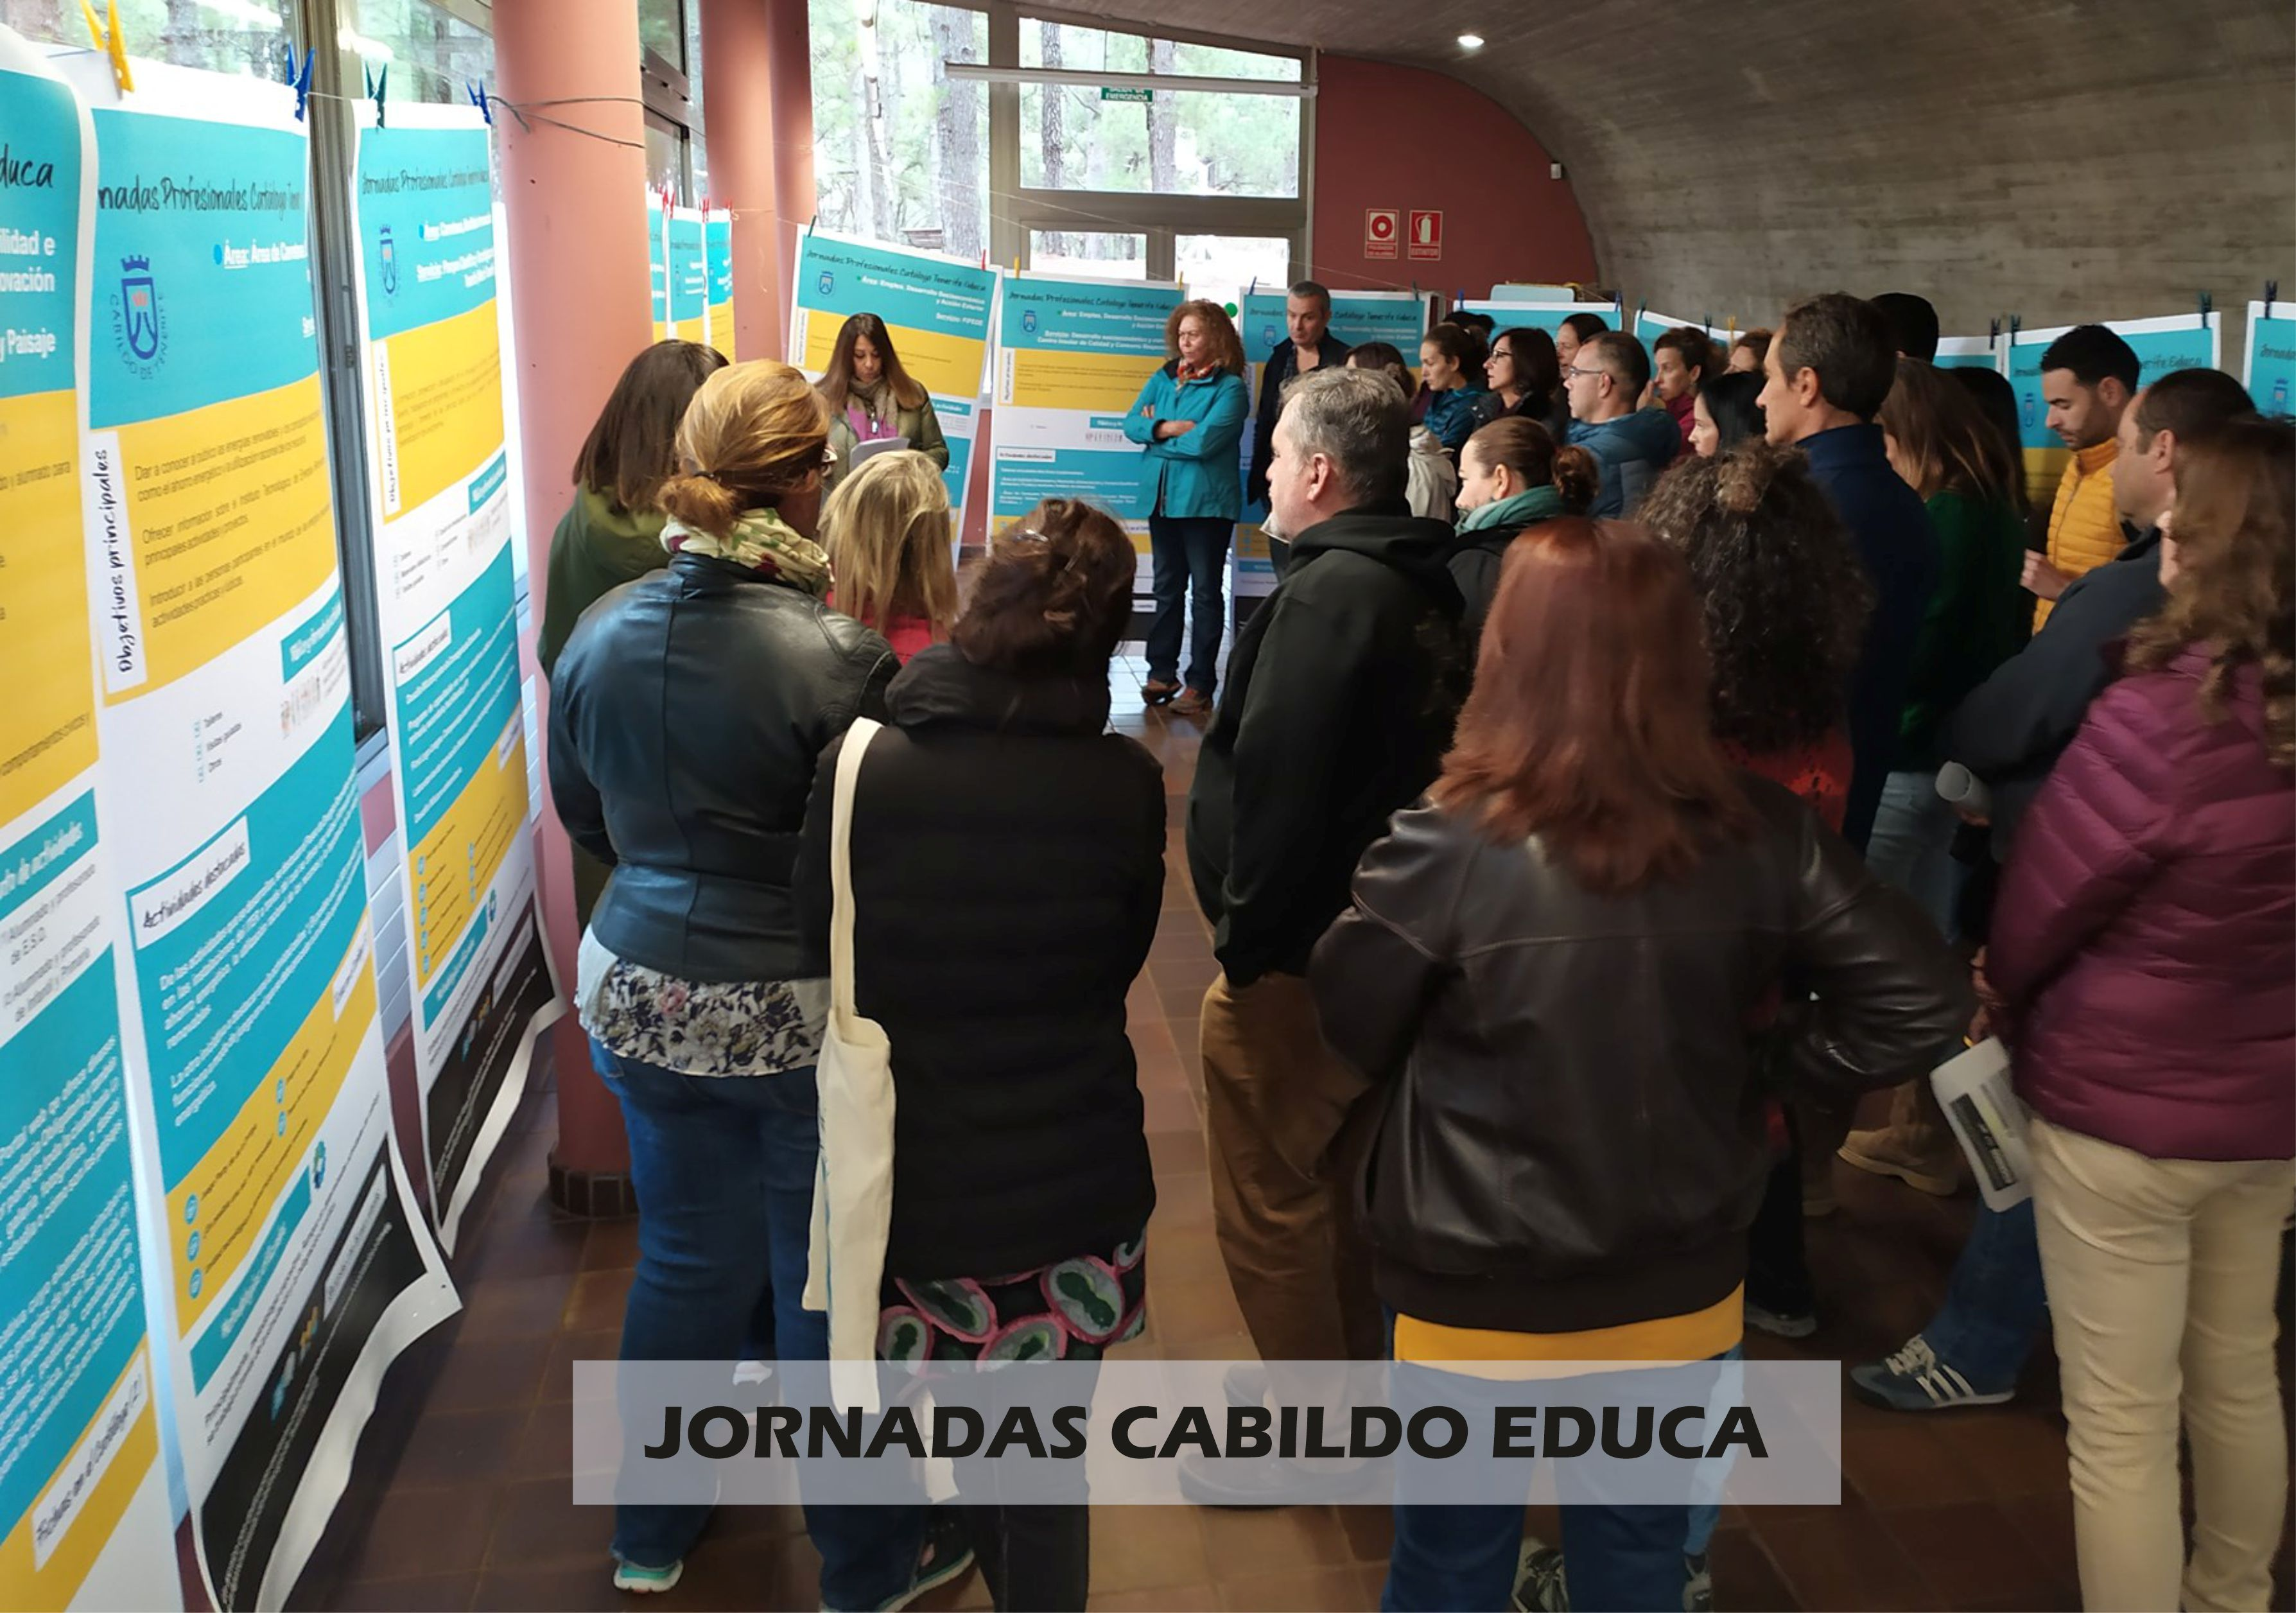 JORNADAS CABILDO EDUCA.jpg